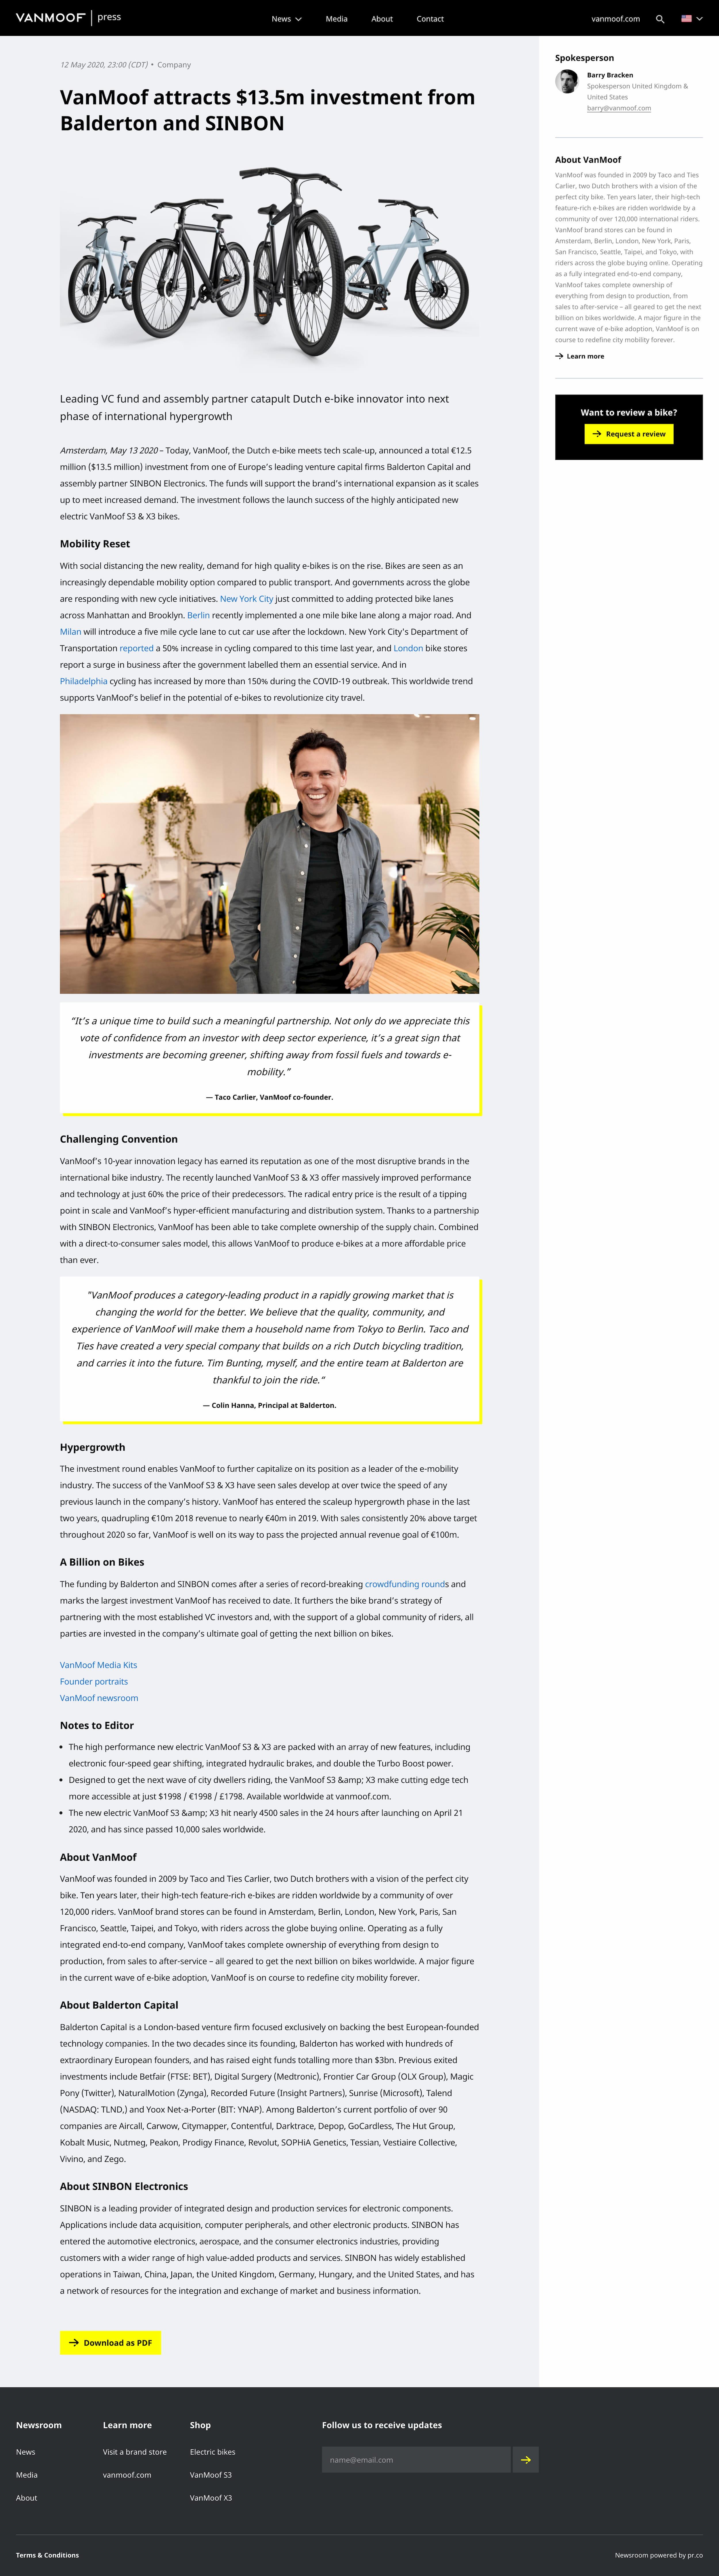 VanMoof_attracts_13_5m_investment_from_Balderton_and_SINBON_VanMoofVanMoof_attracts_13_5m_investment_from_Balderton_and_SINBON_VanMoof_news_